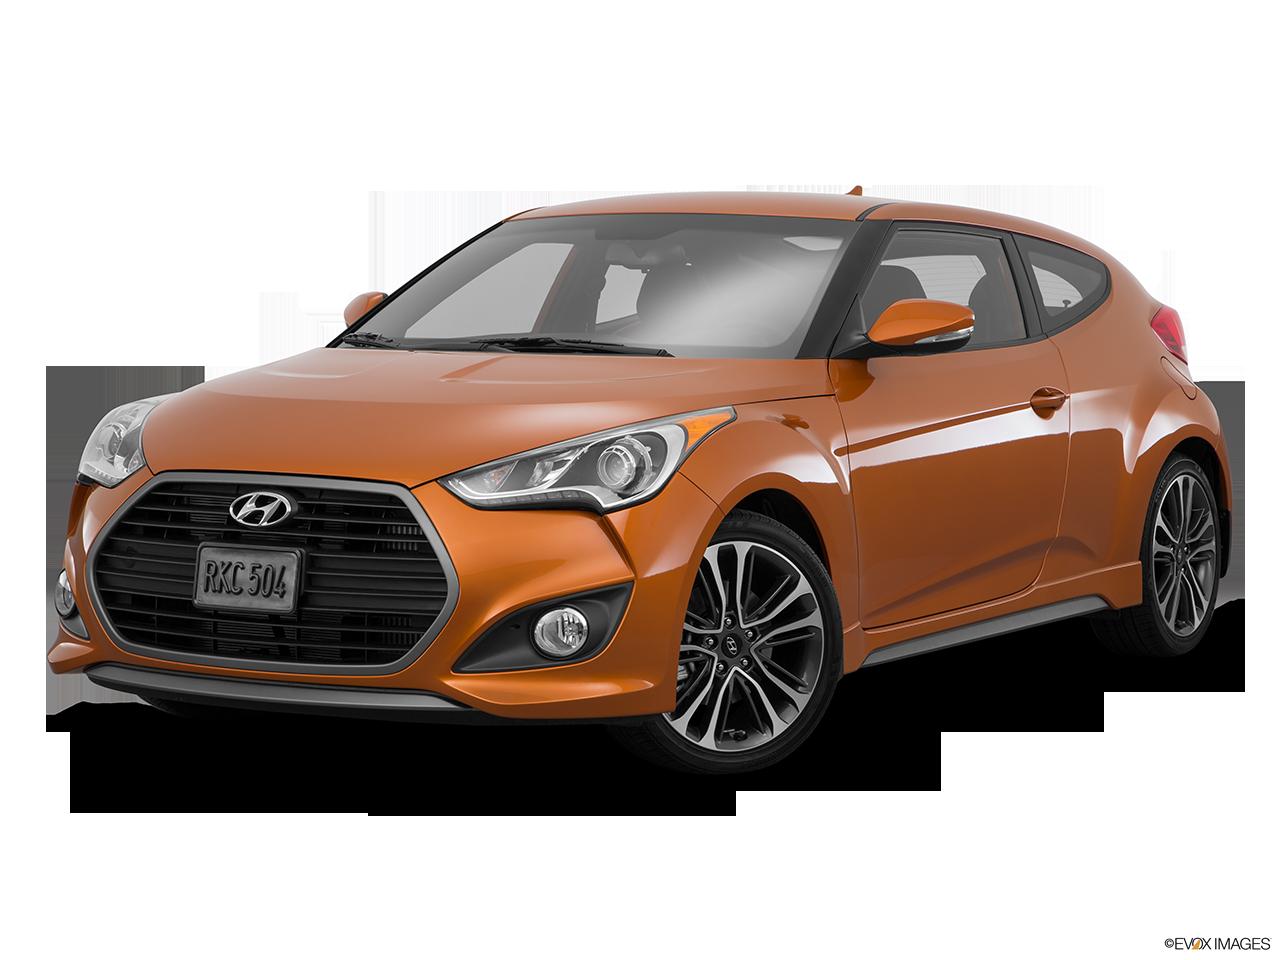 Test Drive A 2016 Hyundai Veloster at Ontario Hyundai in Ontario